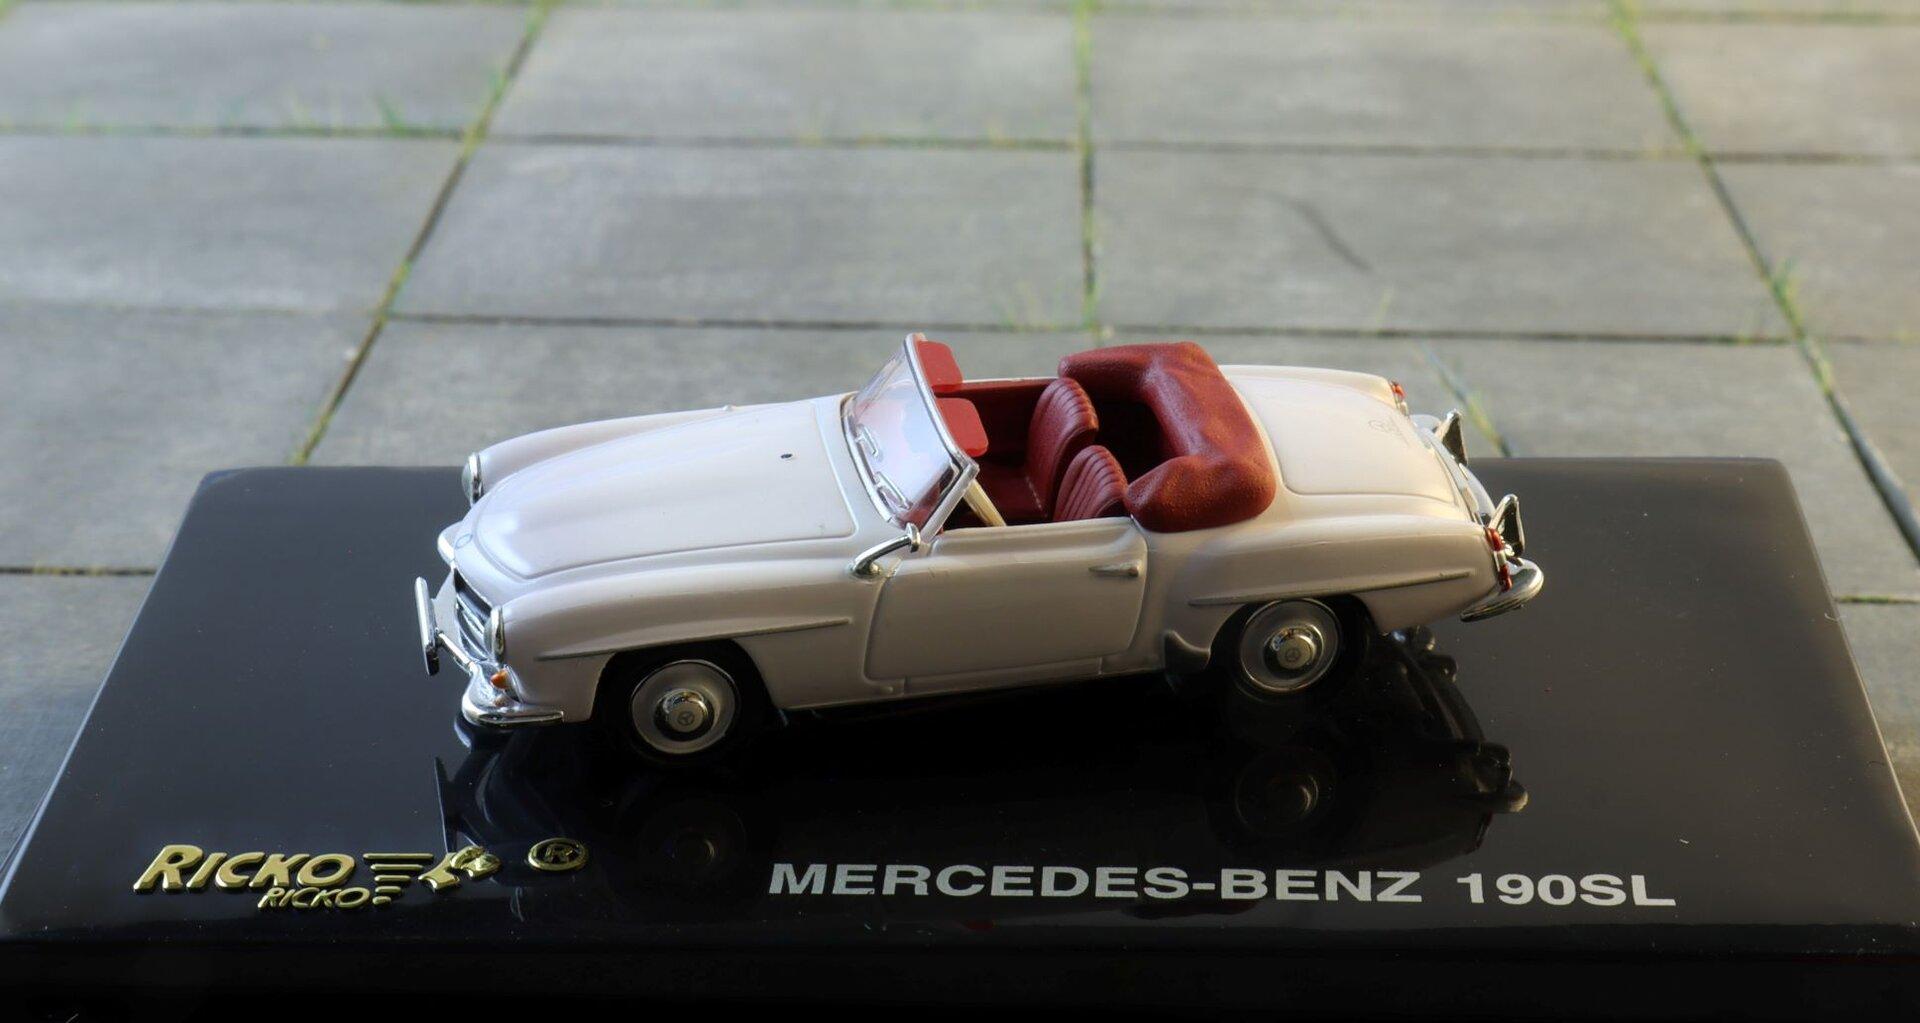 Mercedes 190sl  Ricko .JPG